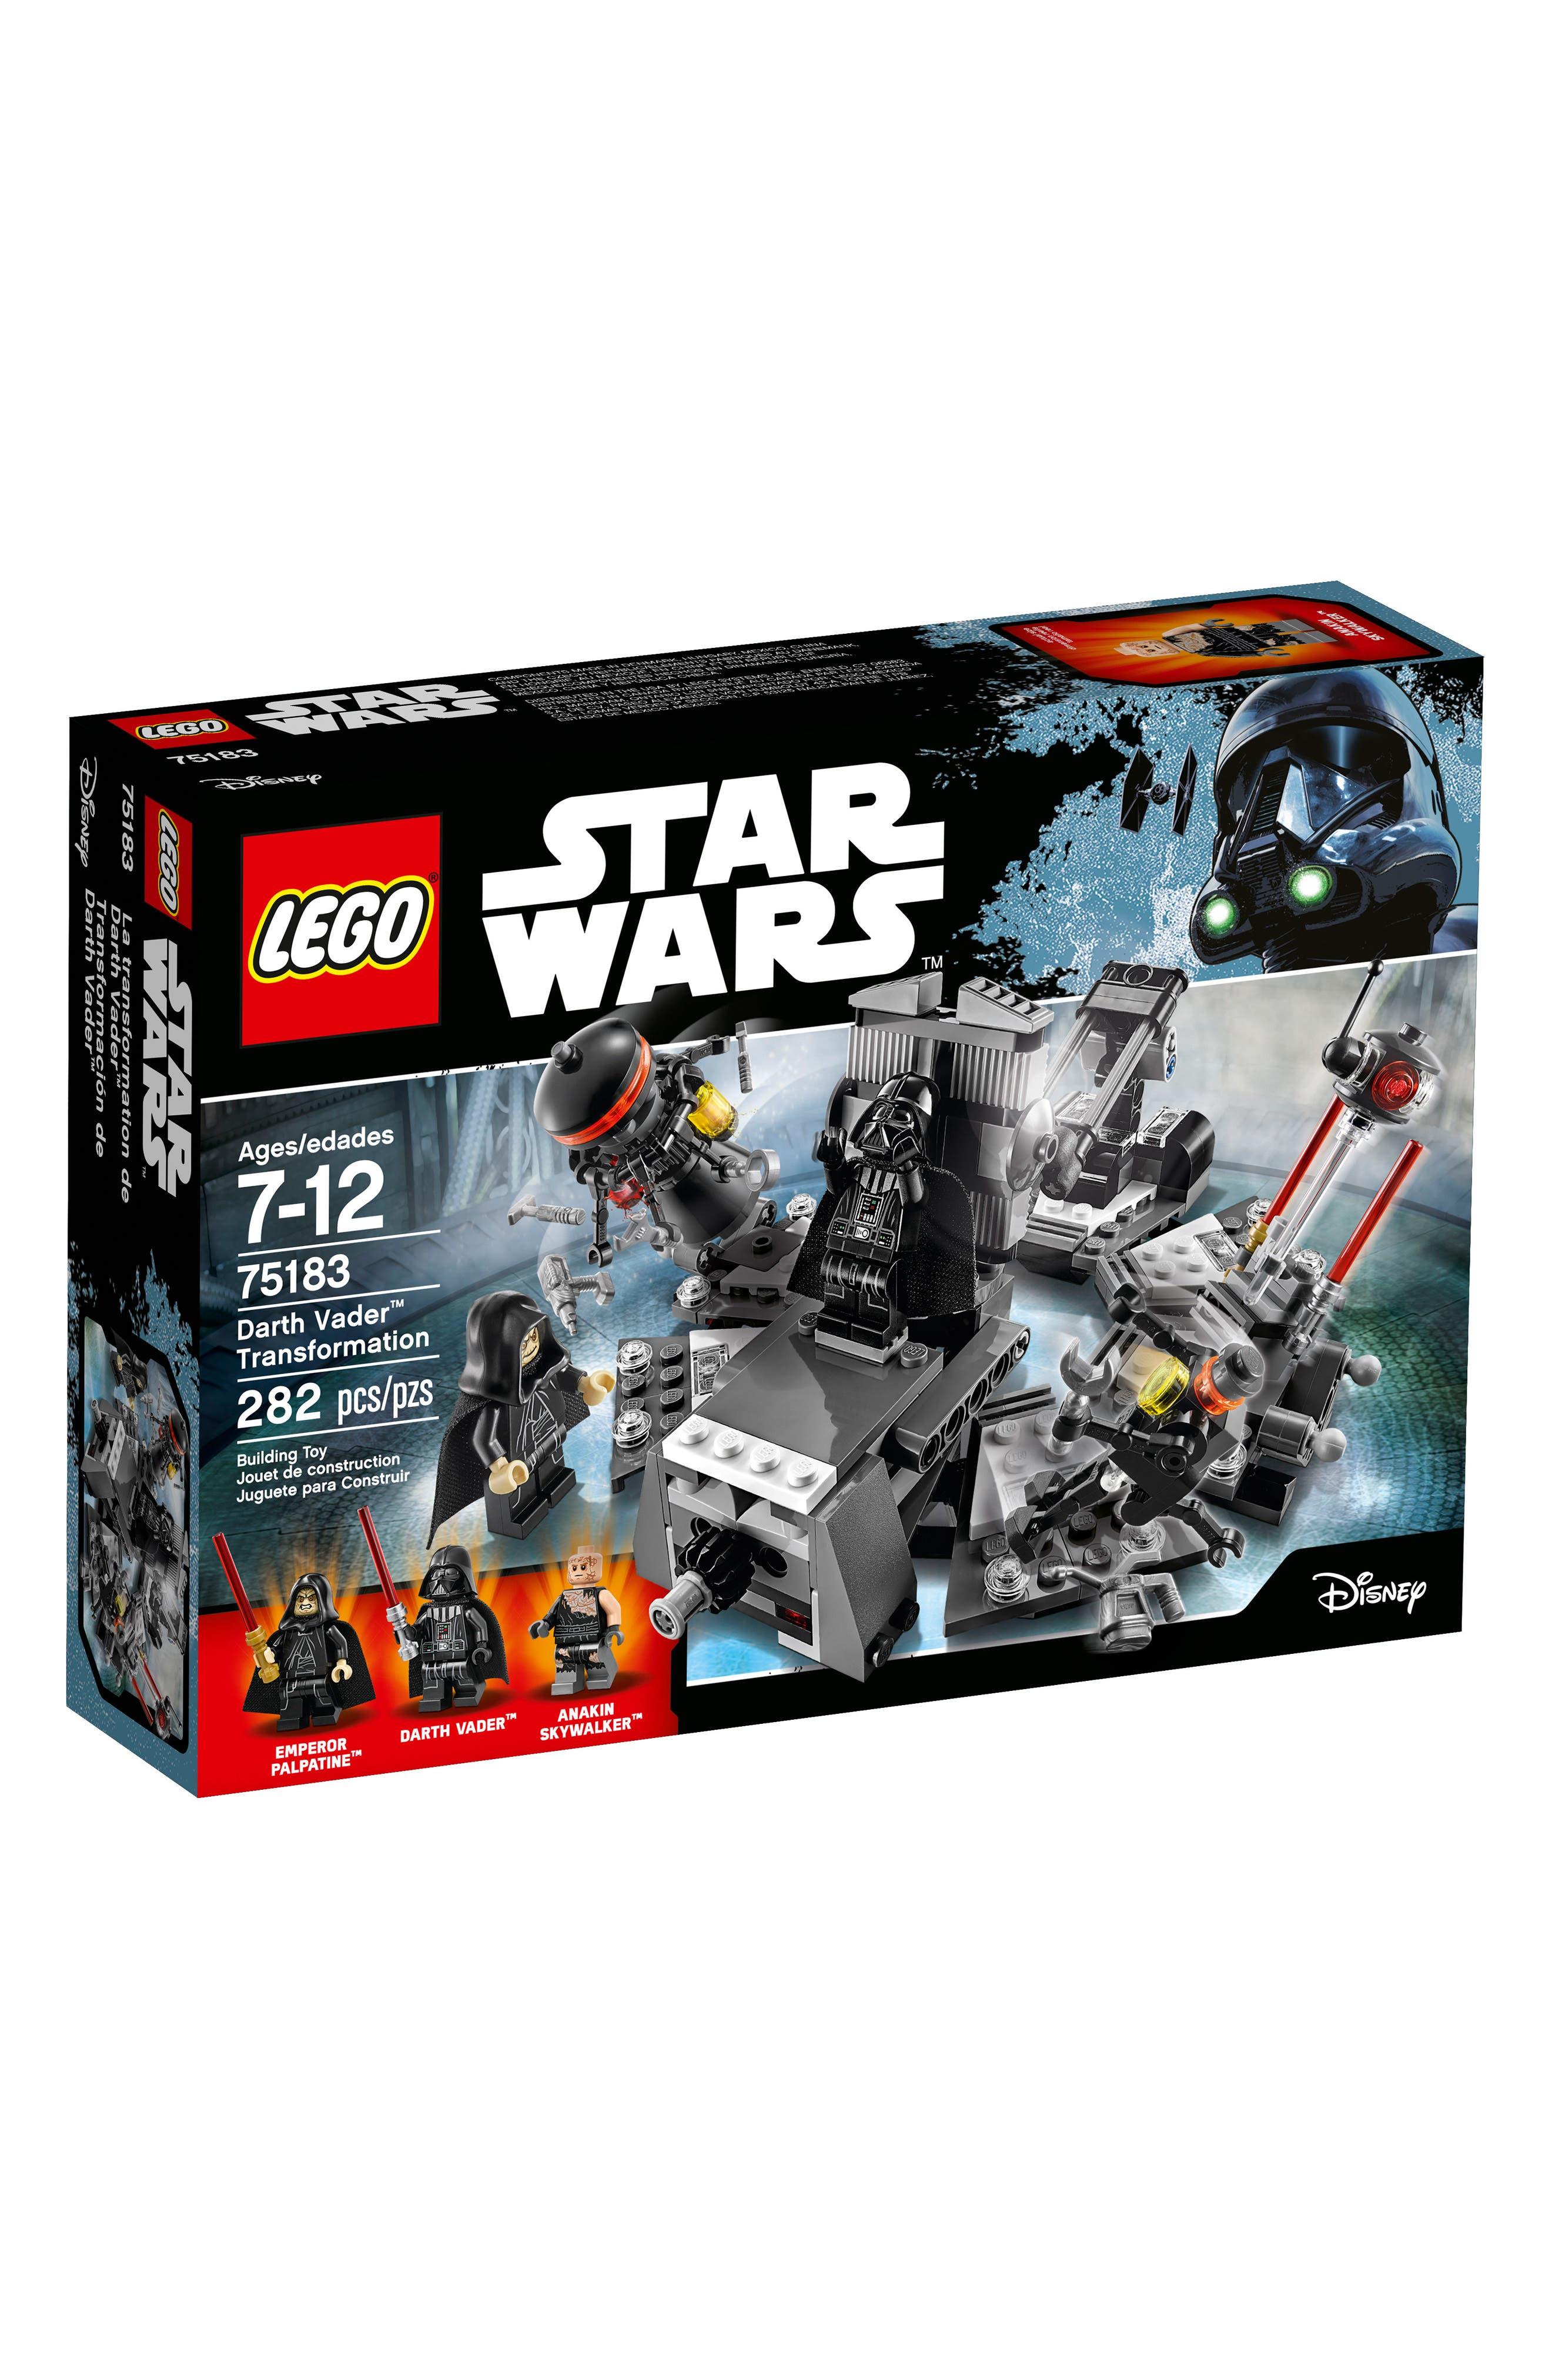 Star Wars<sup>™</sup> Revenge of the Sith Darth Vader Transformation - 75183,                             Main thumbnail 1, color,                             Multi